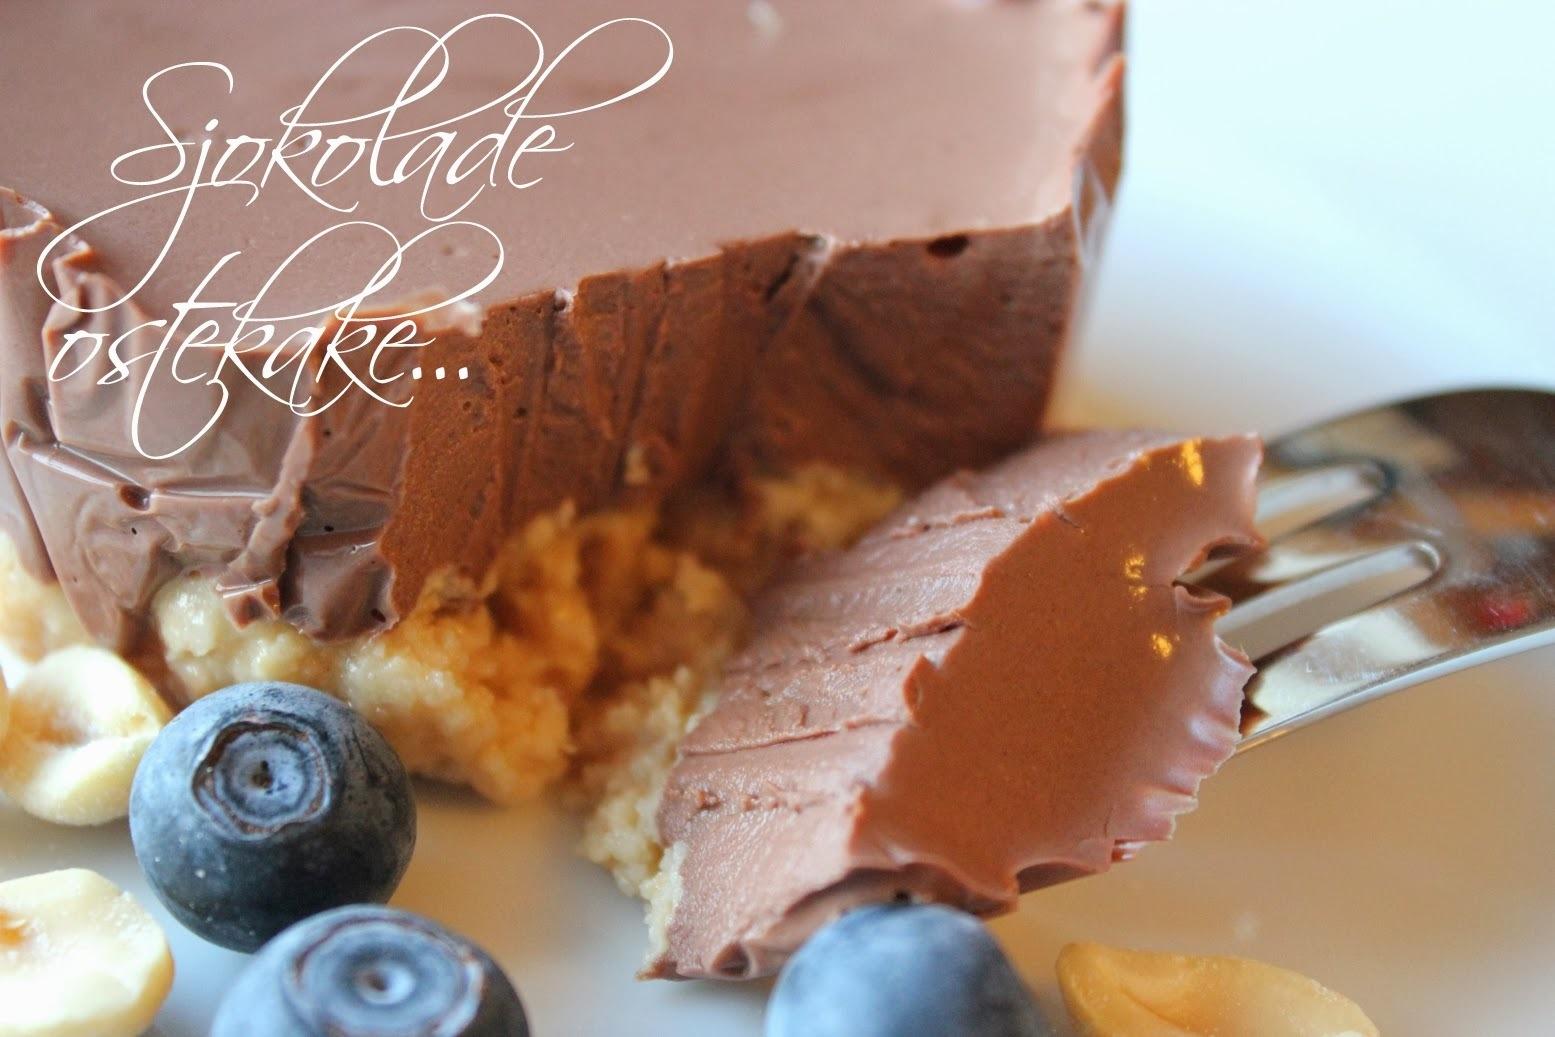 kinder kake